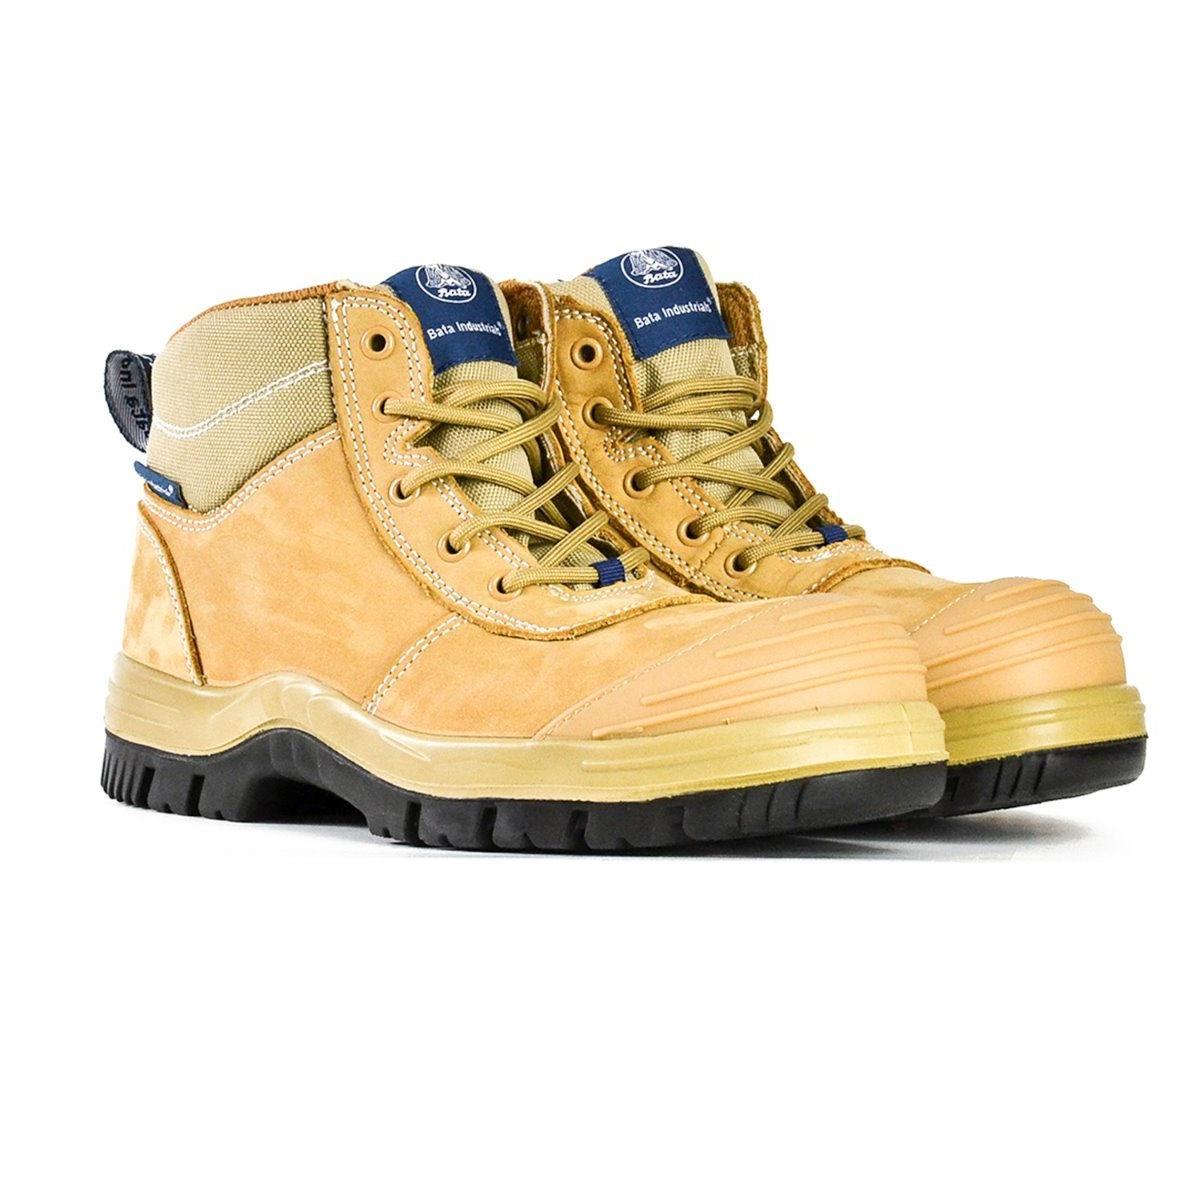 4dc7c24e783 Bata Zippy Wheat Unisex Zip/Lace Low Safety Boot